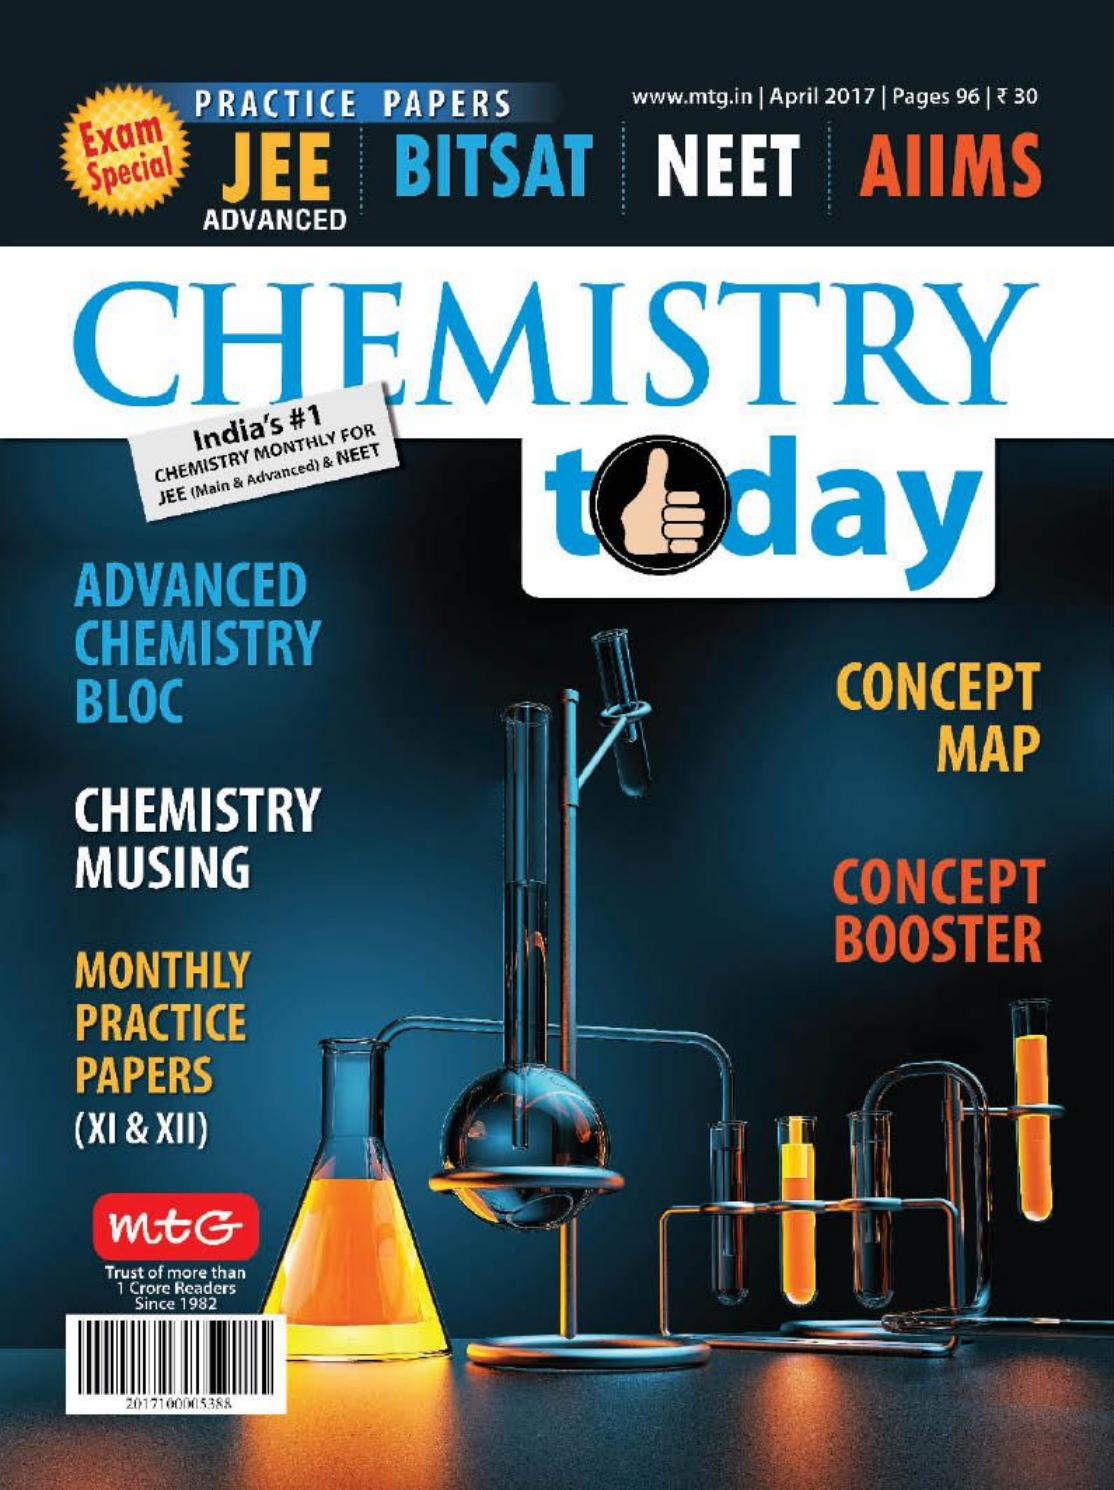 Chemistry today april 2017 vk com stopthepress by Davit - issuu